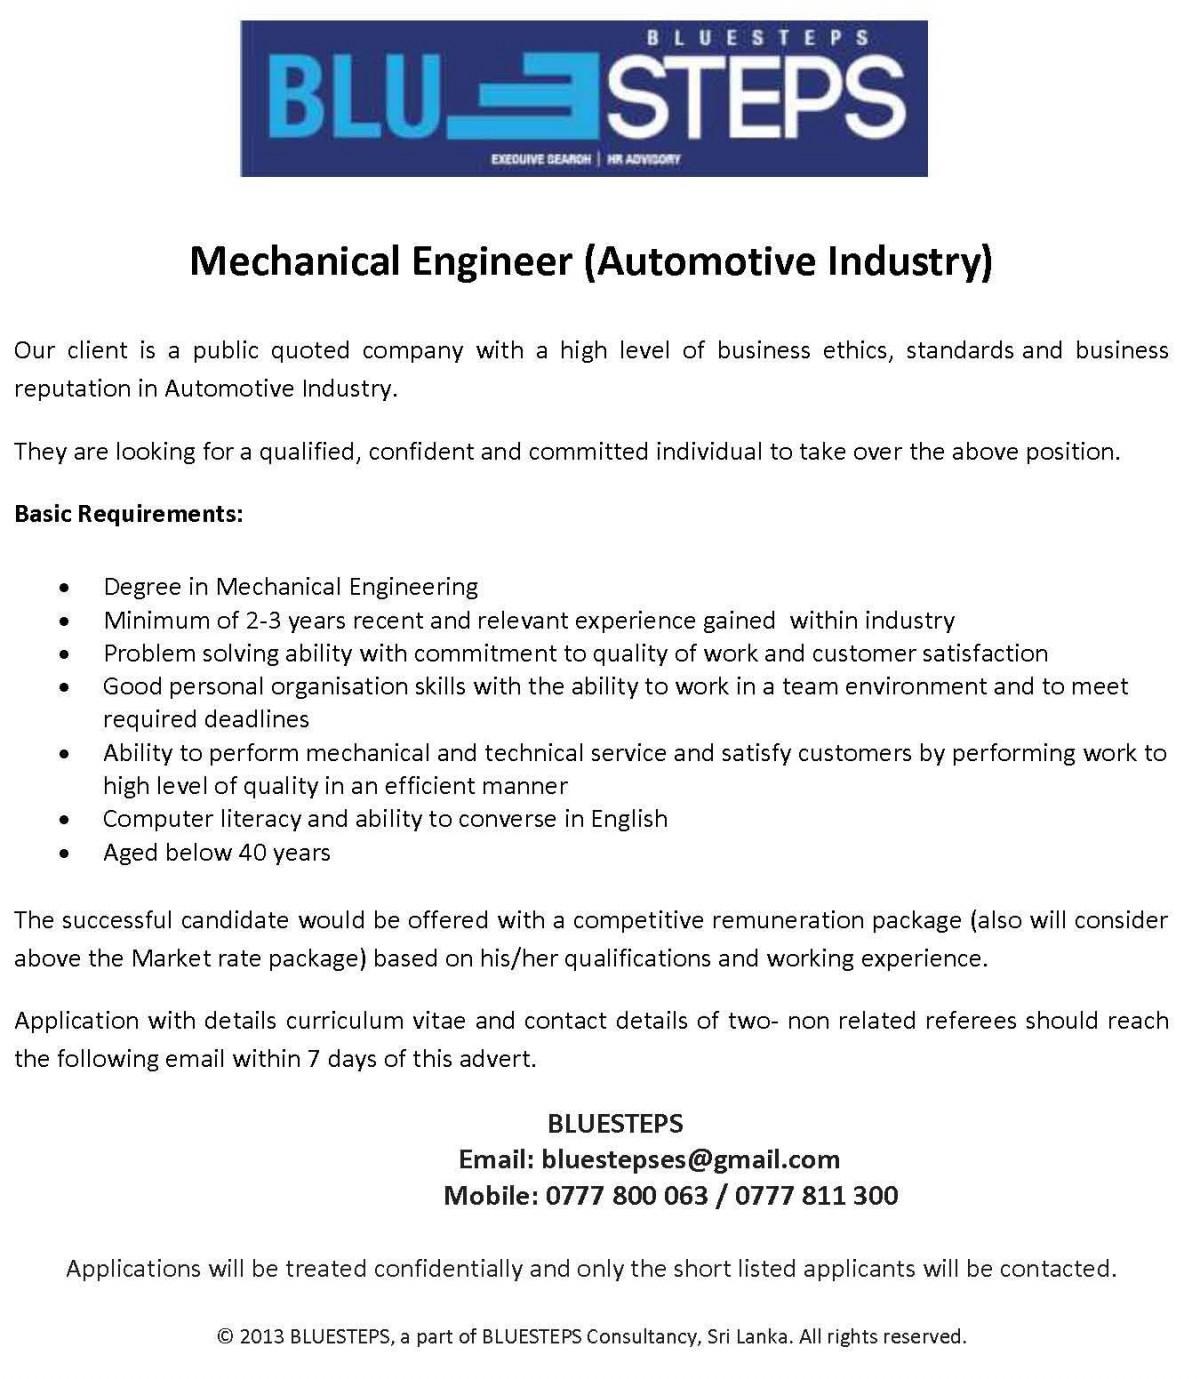 20150413xBjitcpNUtxT6t0 Job Adver Sample For Mechanical Engineer on